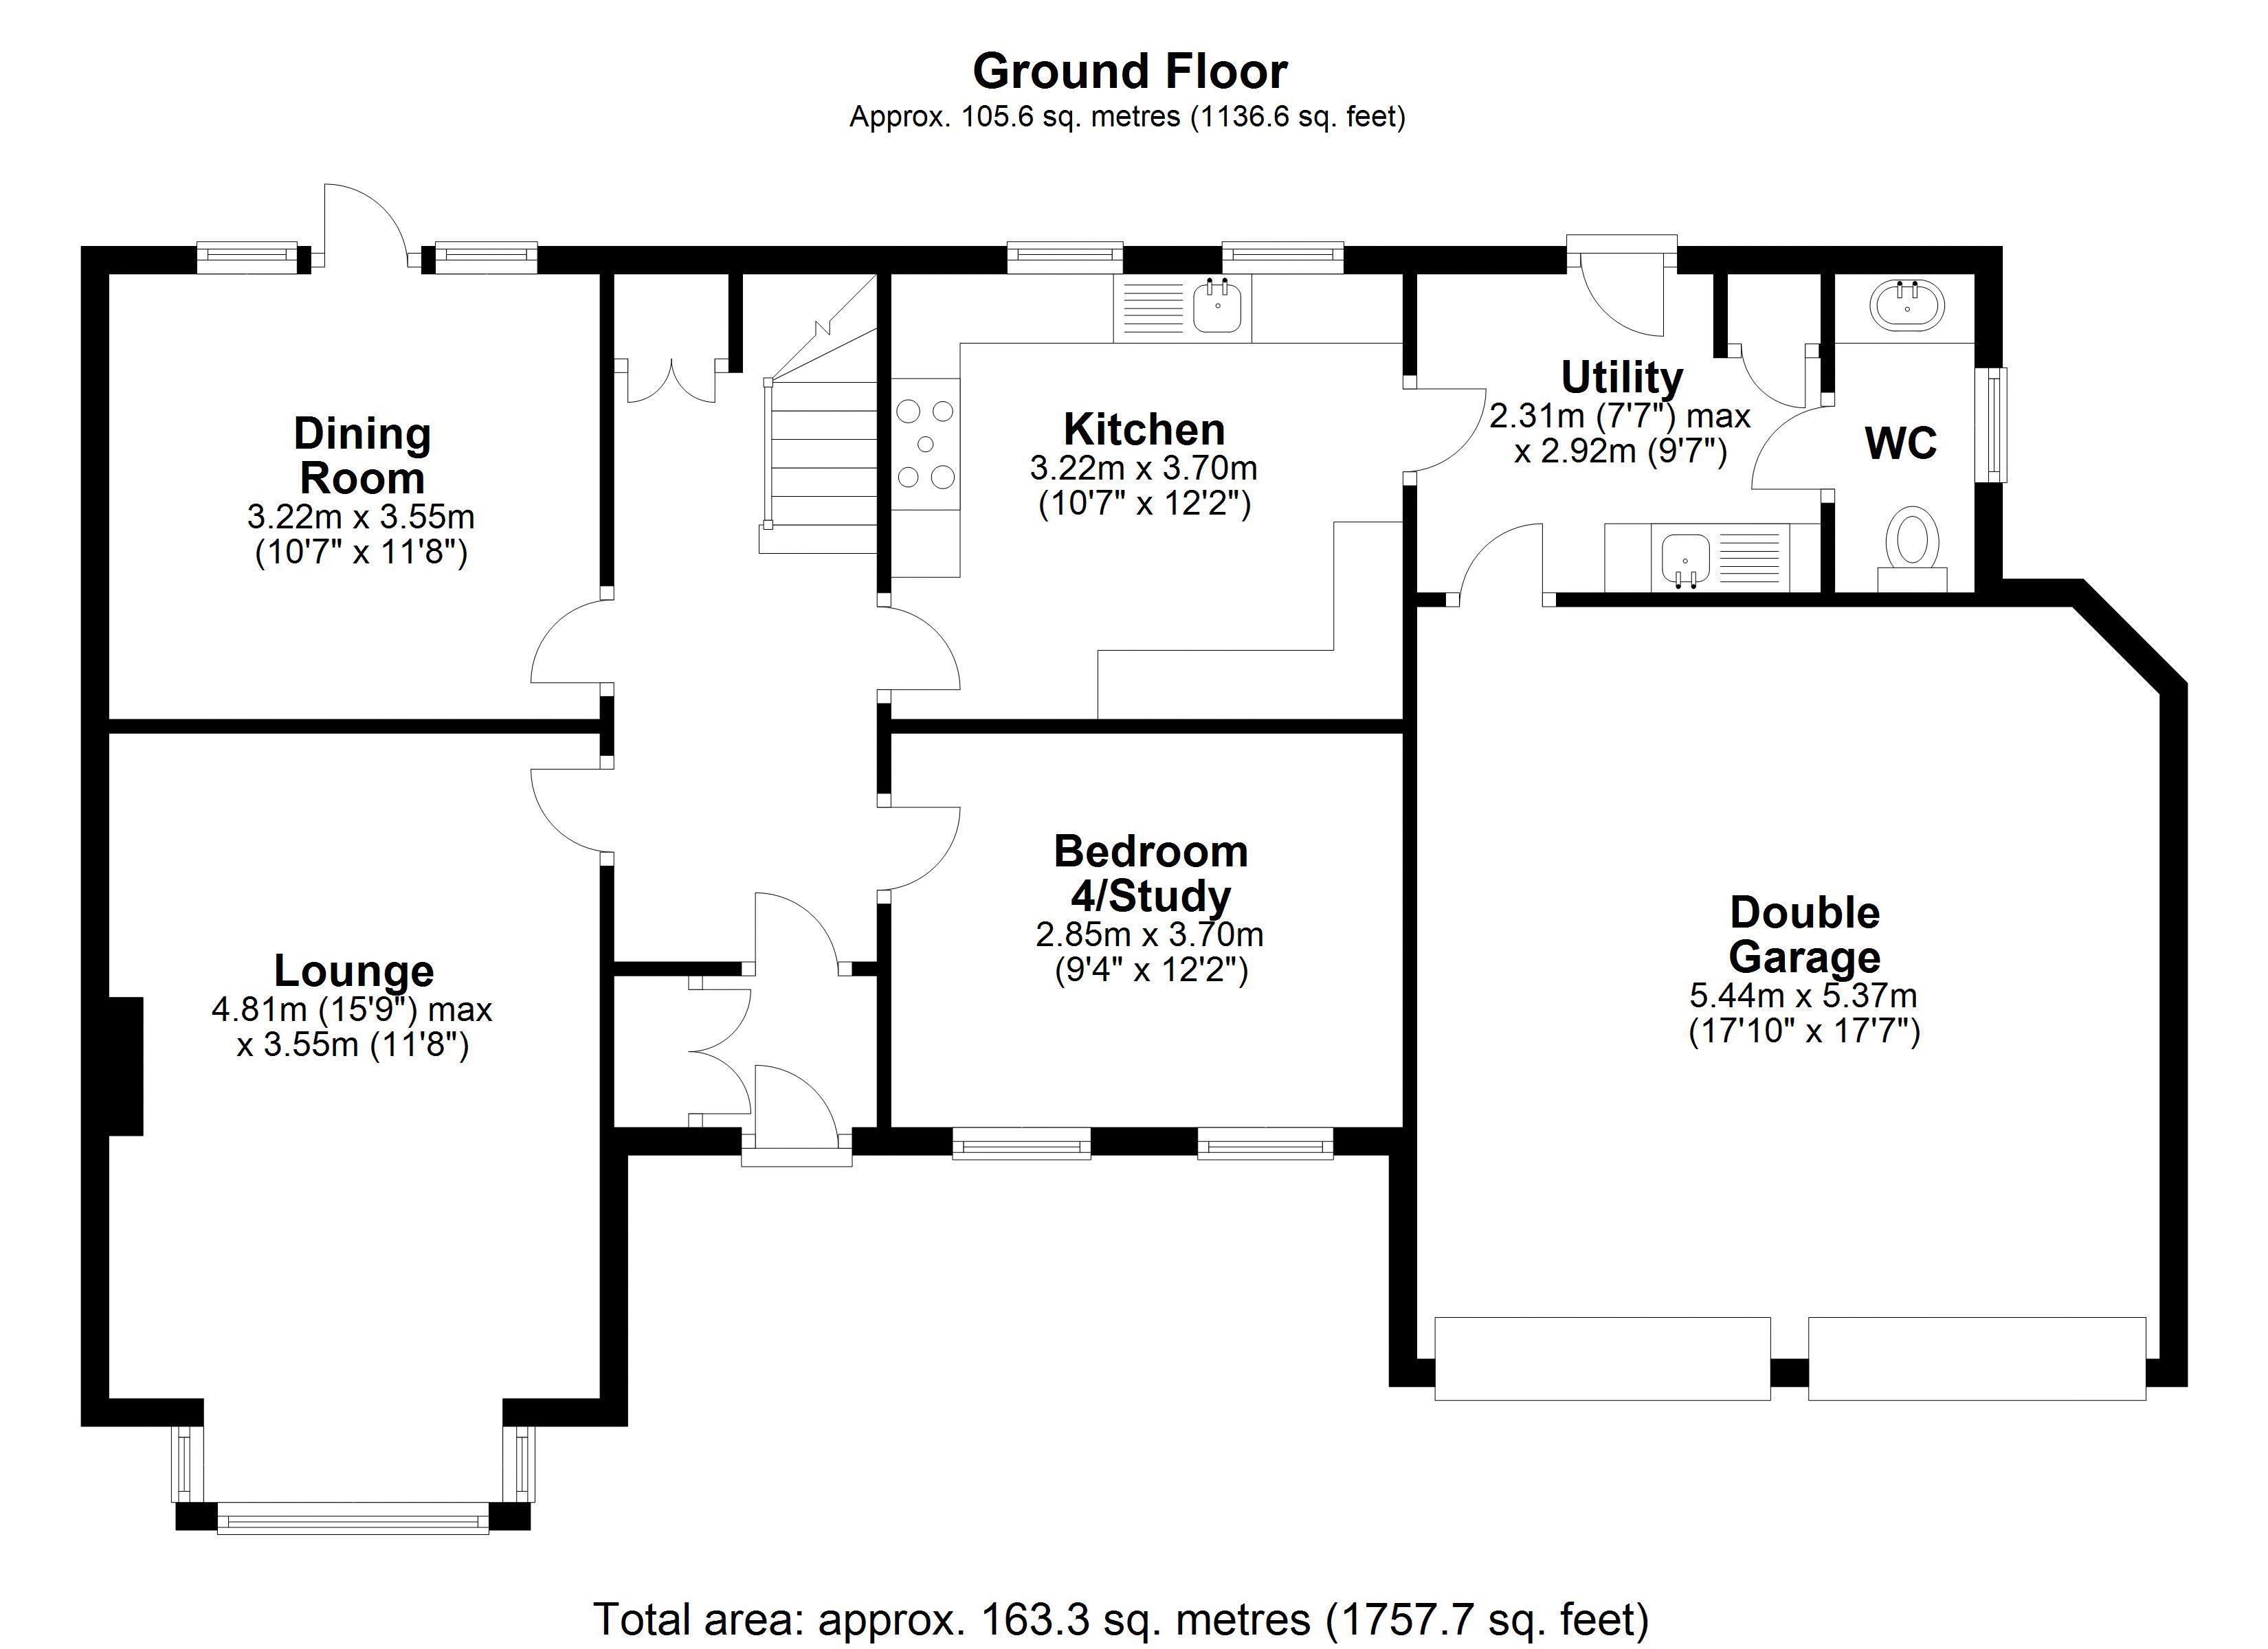 15 Hadley road Ground Floor Plan